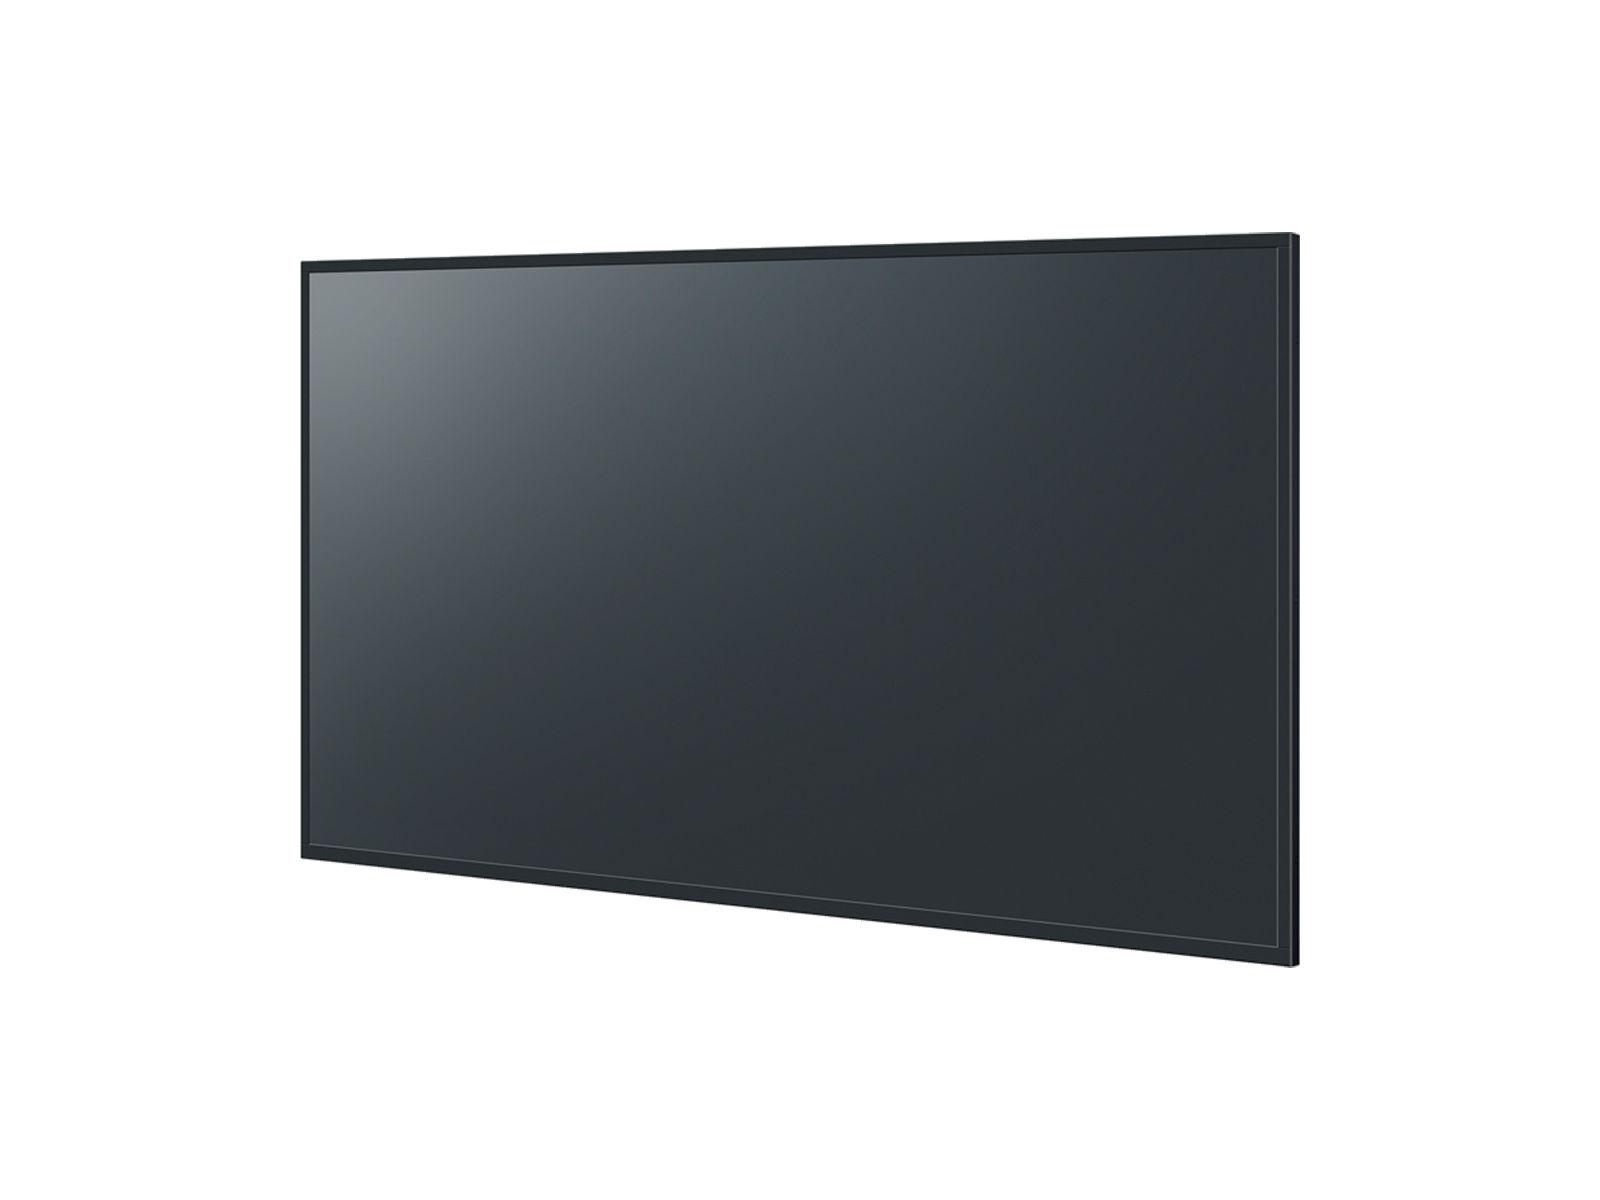 "Panasonic TH-65SQ1-IR | 65"" 164 cm, UHD LCD-Display, LED, 500 cd/m², DigitalLink (4k), Lautsprecher, USB Mediaplayer, schwa"